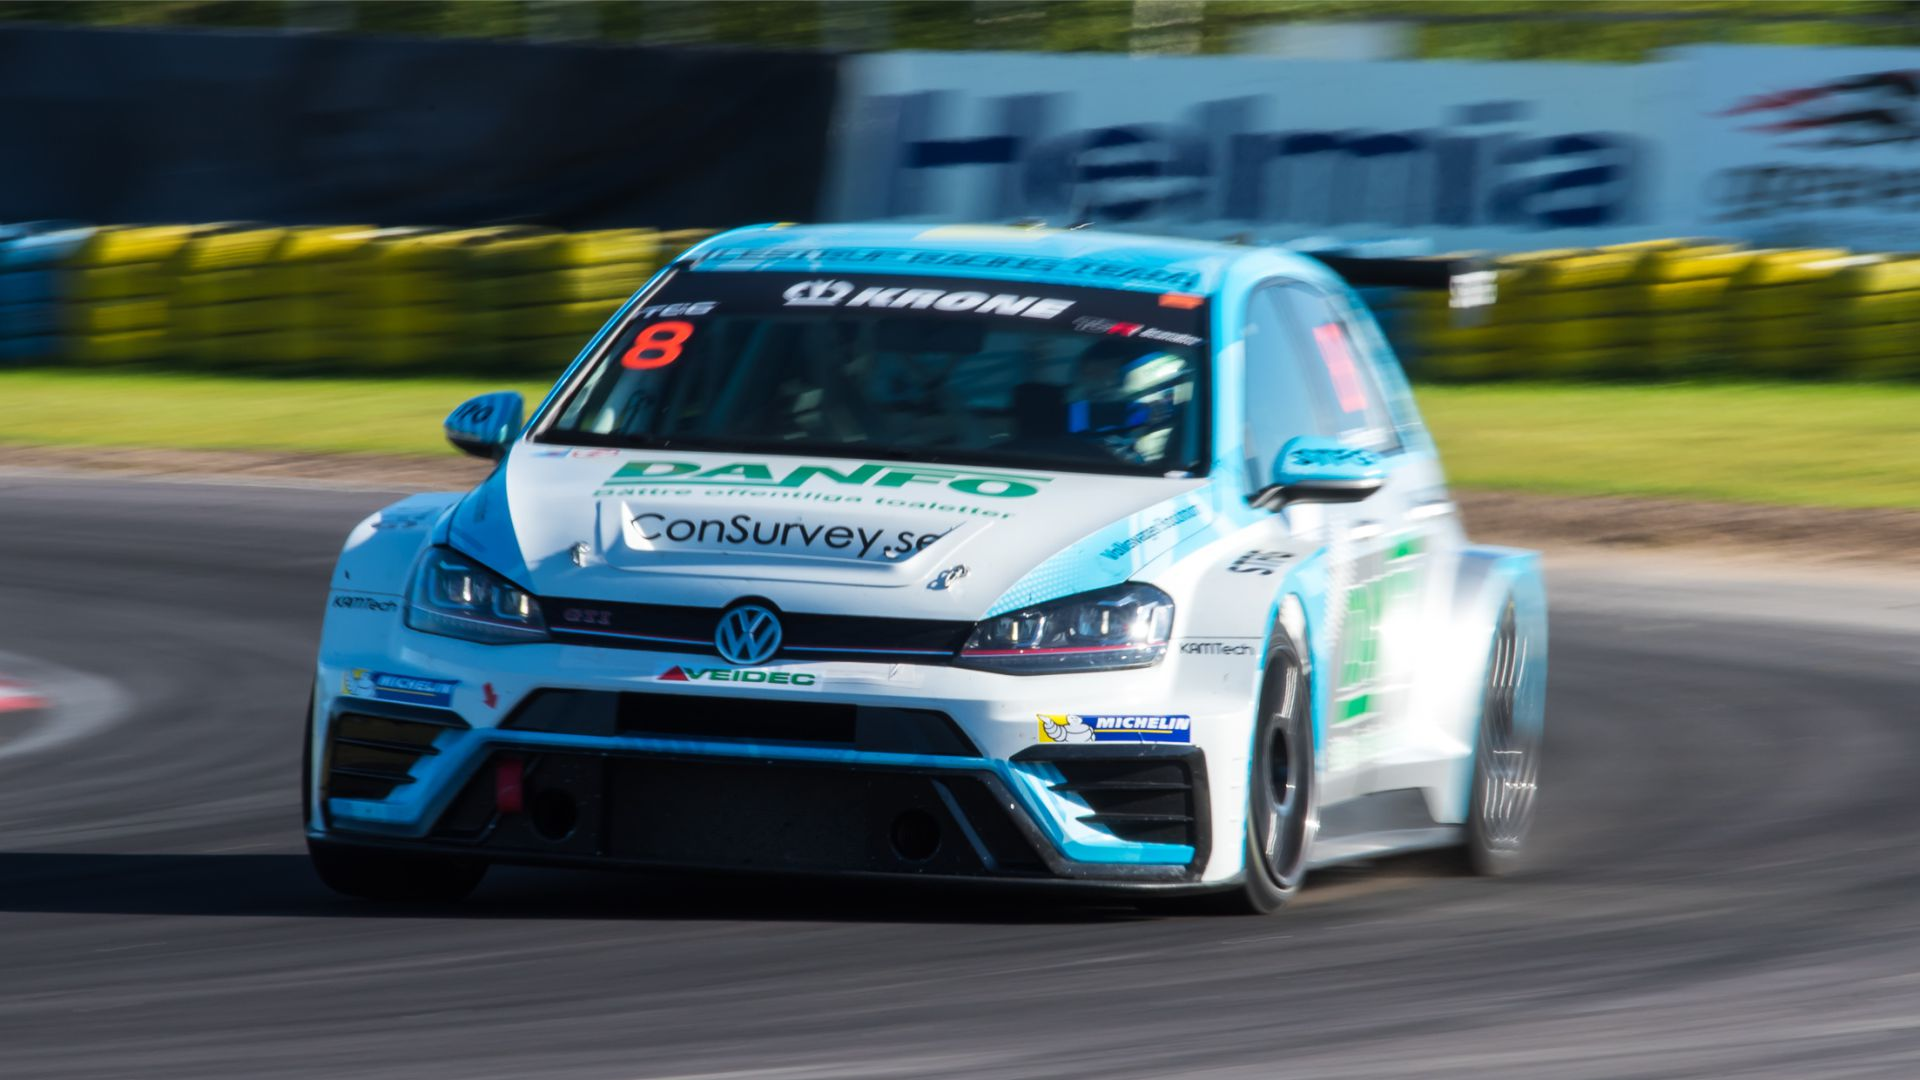 Fredriksson Racing